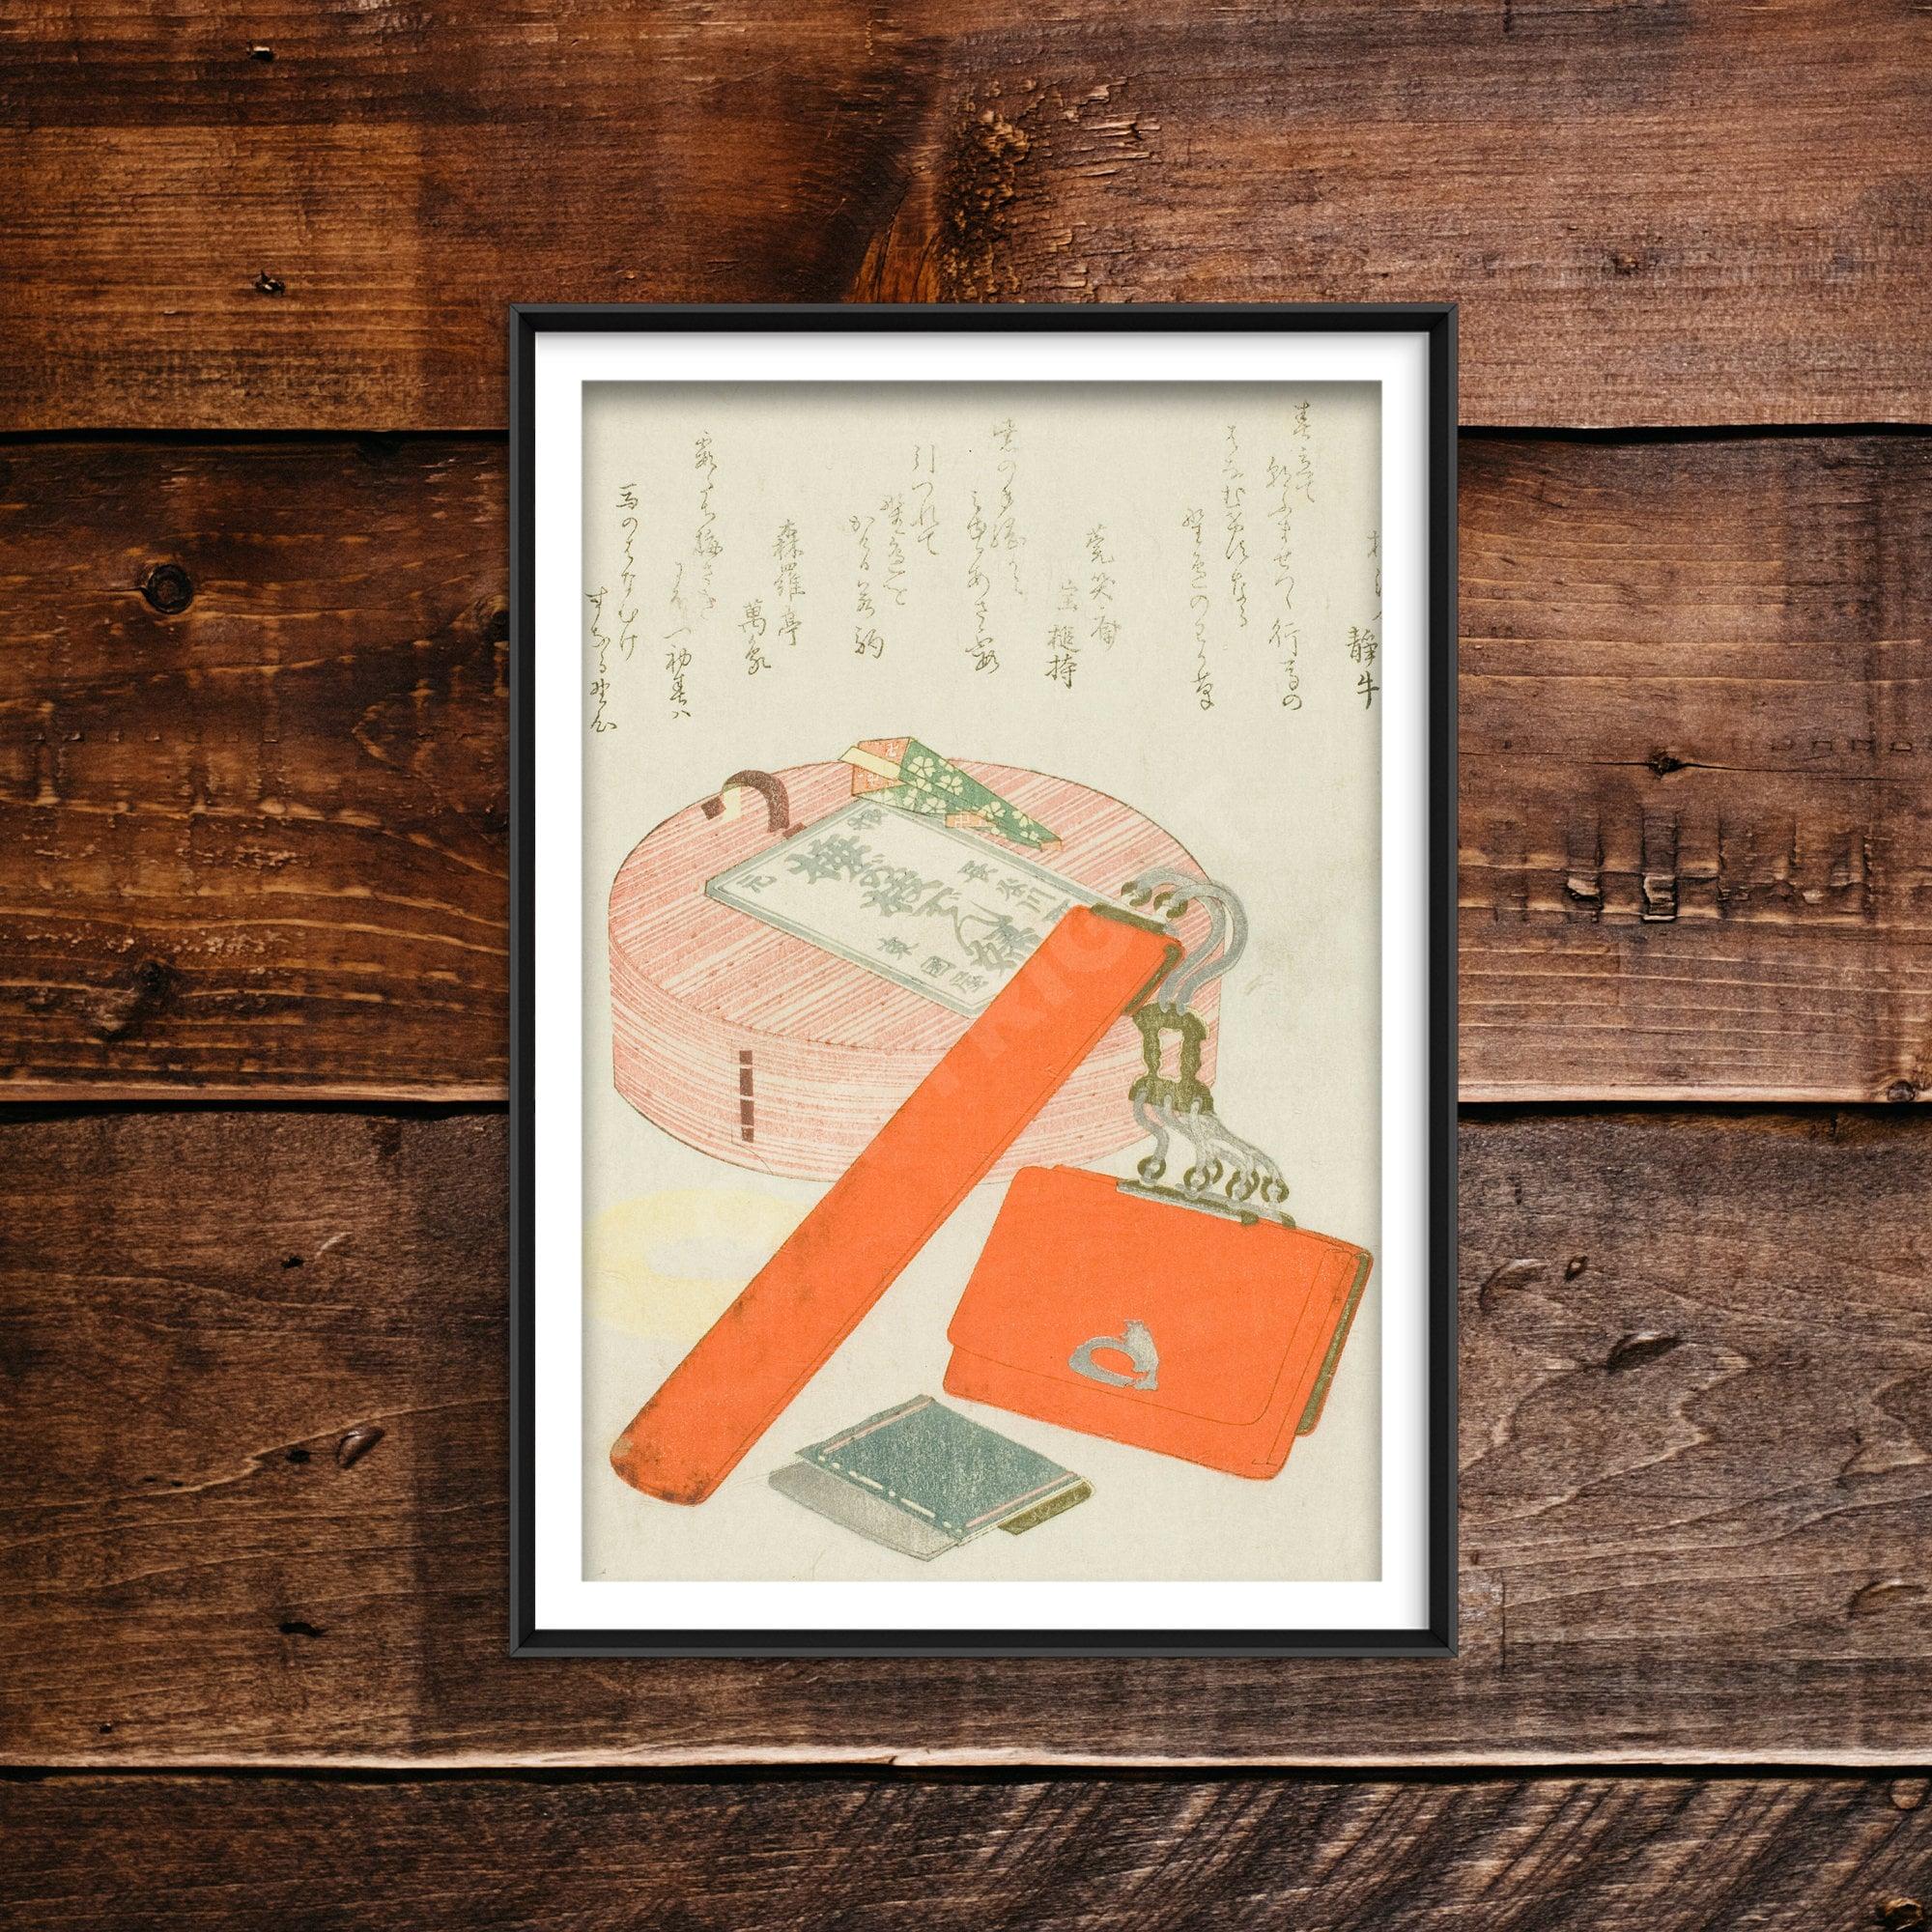 katsushika hokusai farewell gift for the horse 1822  etsy